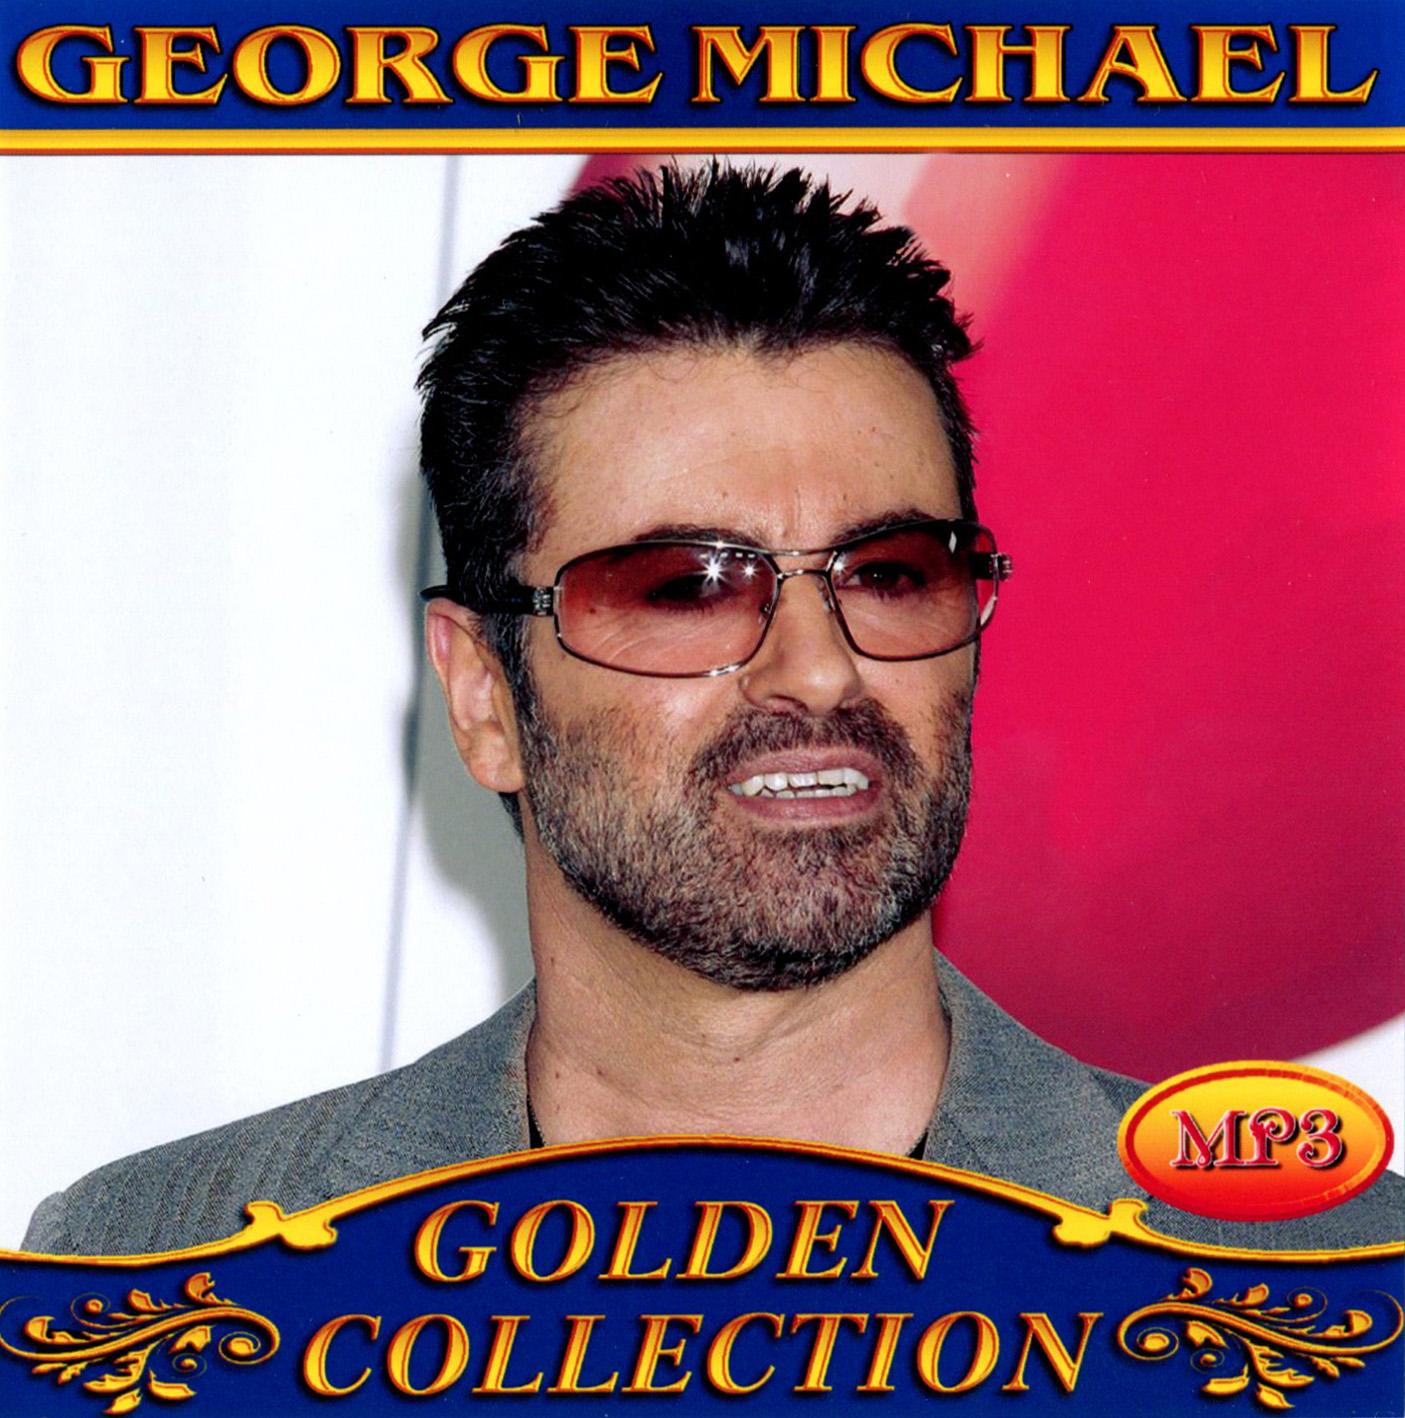 George Michael [mp3]